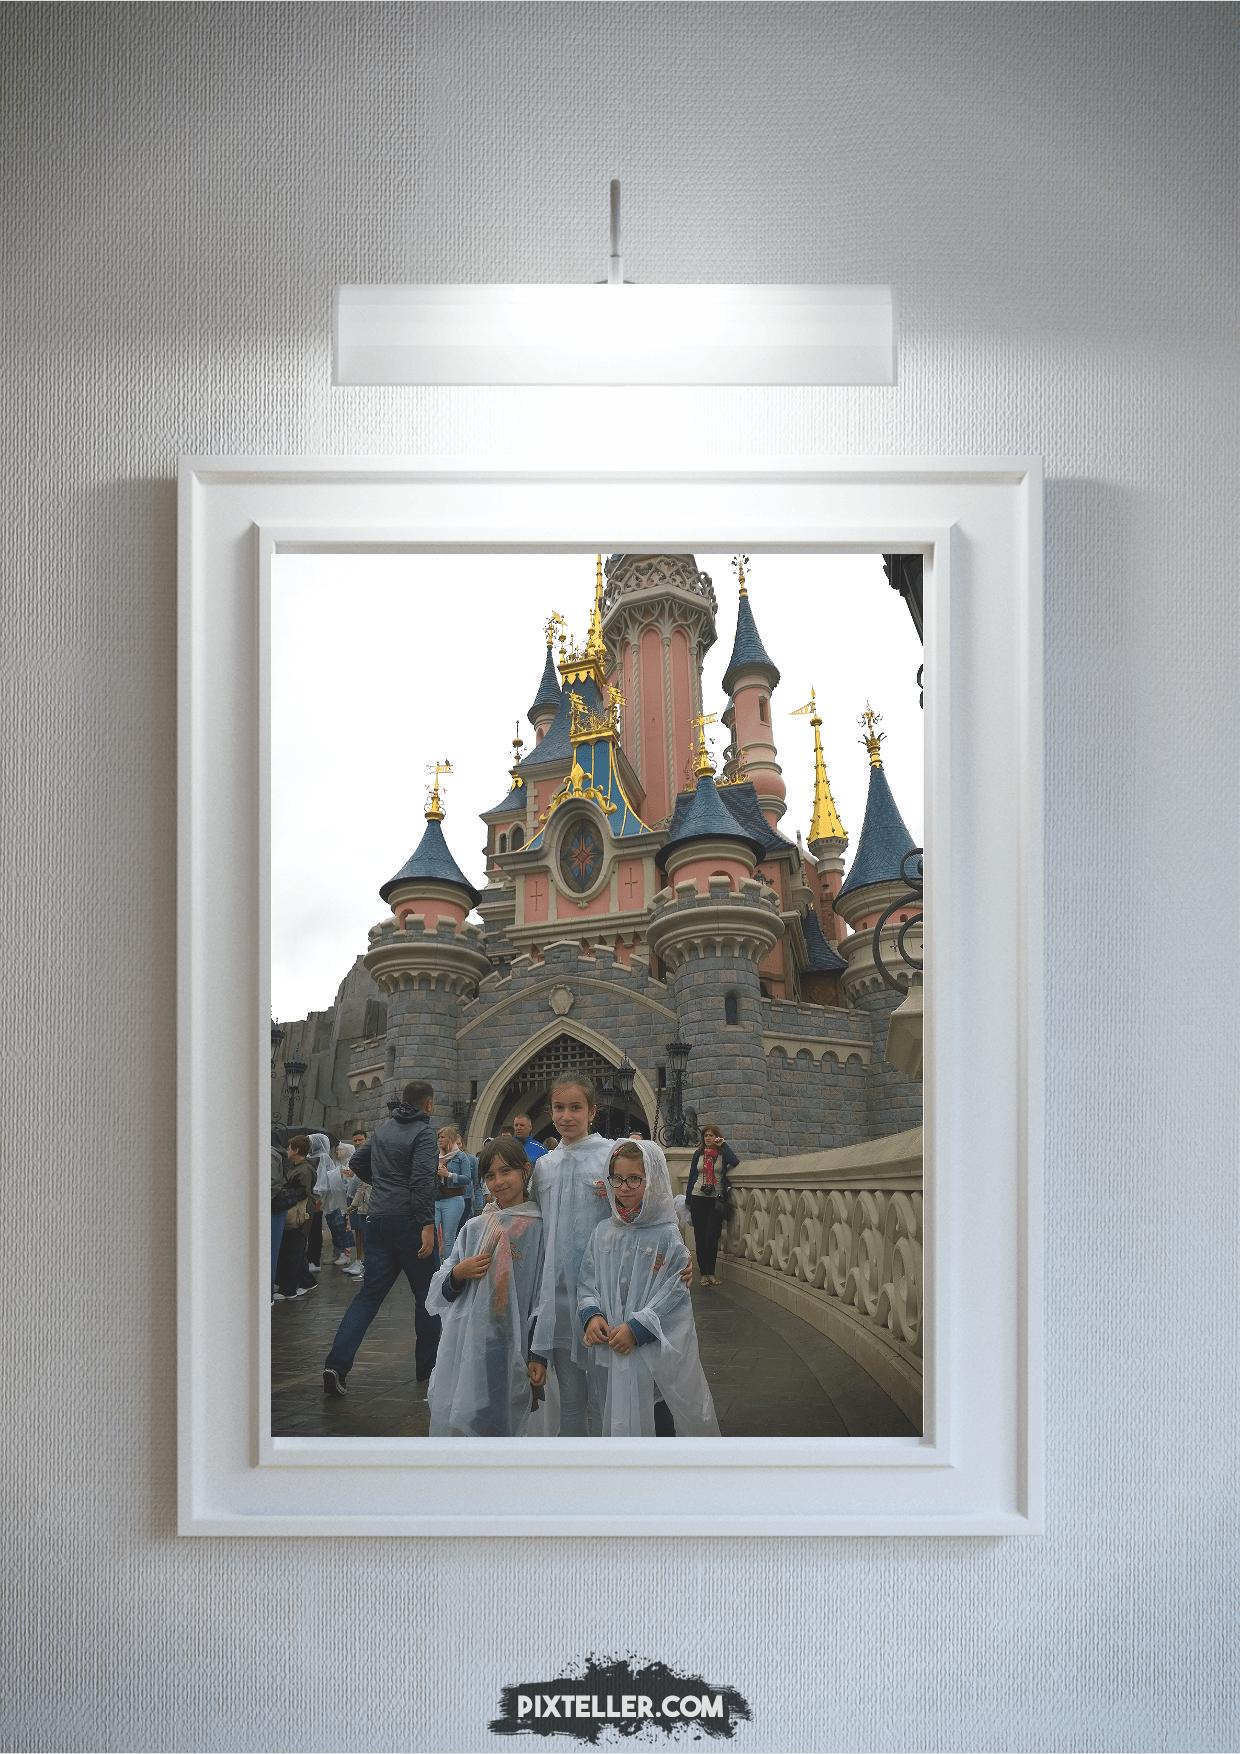 Photograph,                Picture,                Frame,                Art,                Window,                Interior,                Design,                Mockup,                Inspiration,                Life,                Photo,                Image,                White,                 Free Image